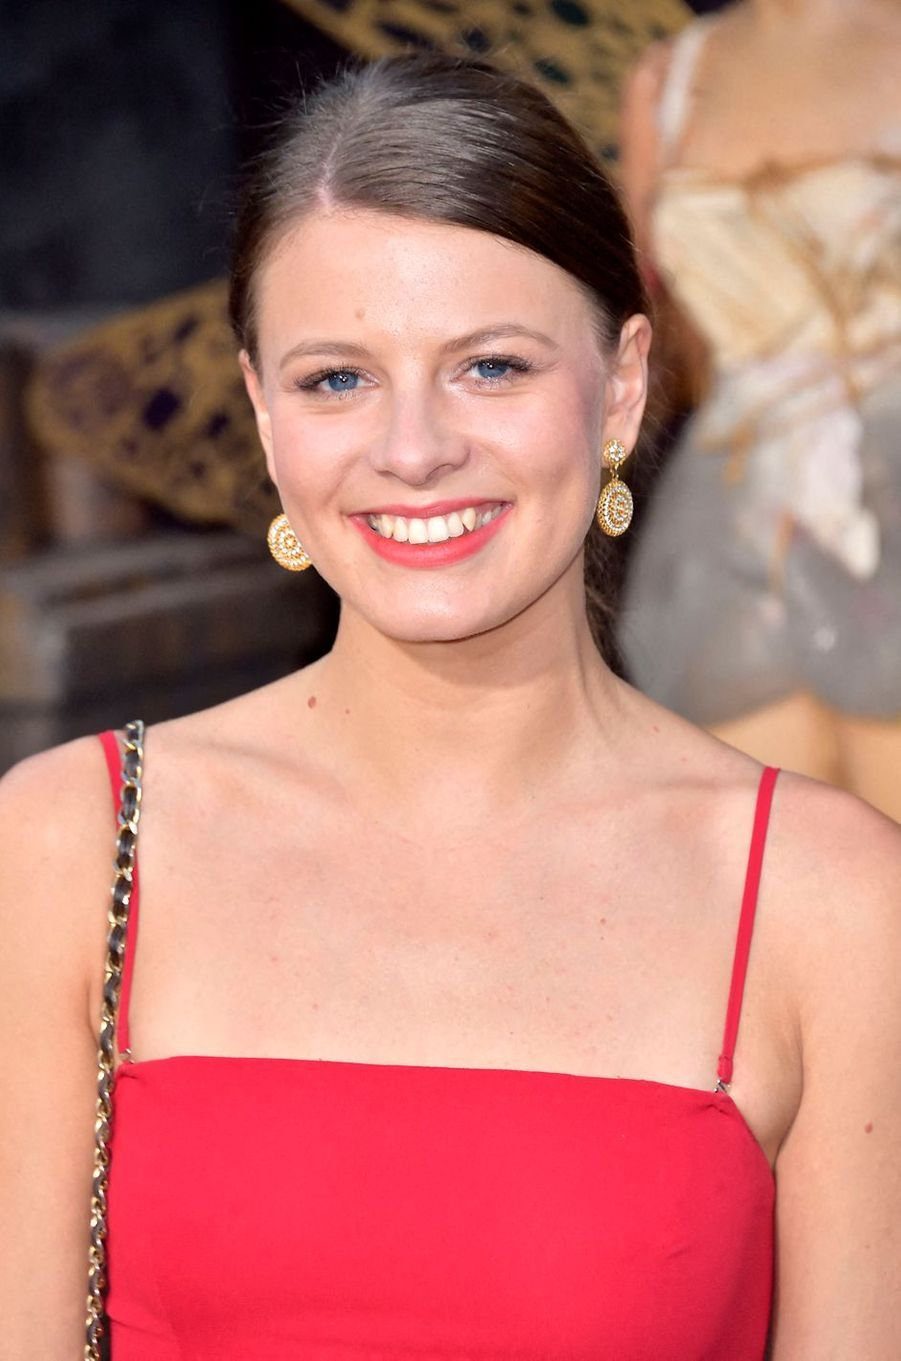 Flora Alexandra Ogilvy, petite-fille de la princesse Alexandra de Kent, (ici le 21 août 2019) va se marier en 2020